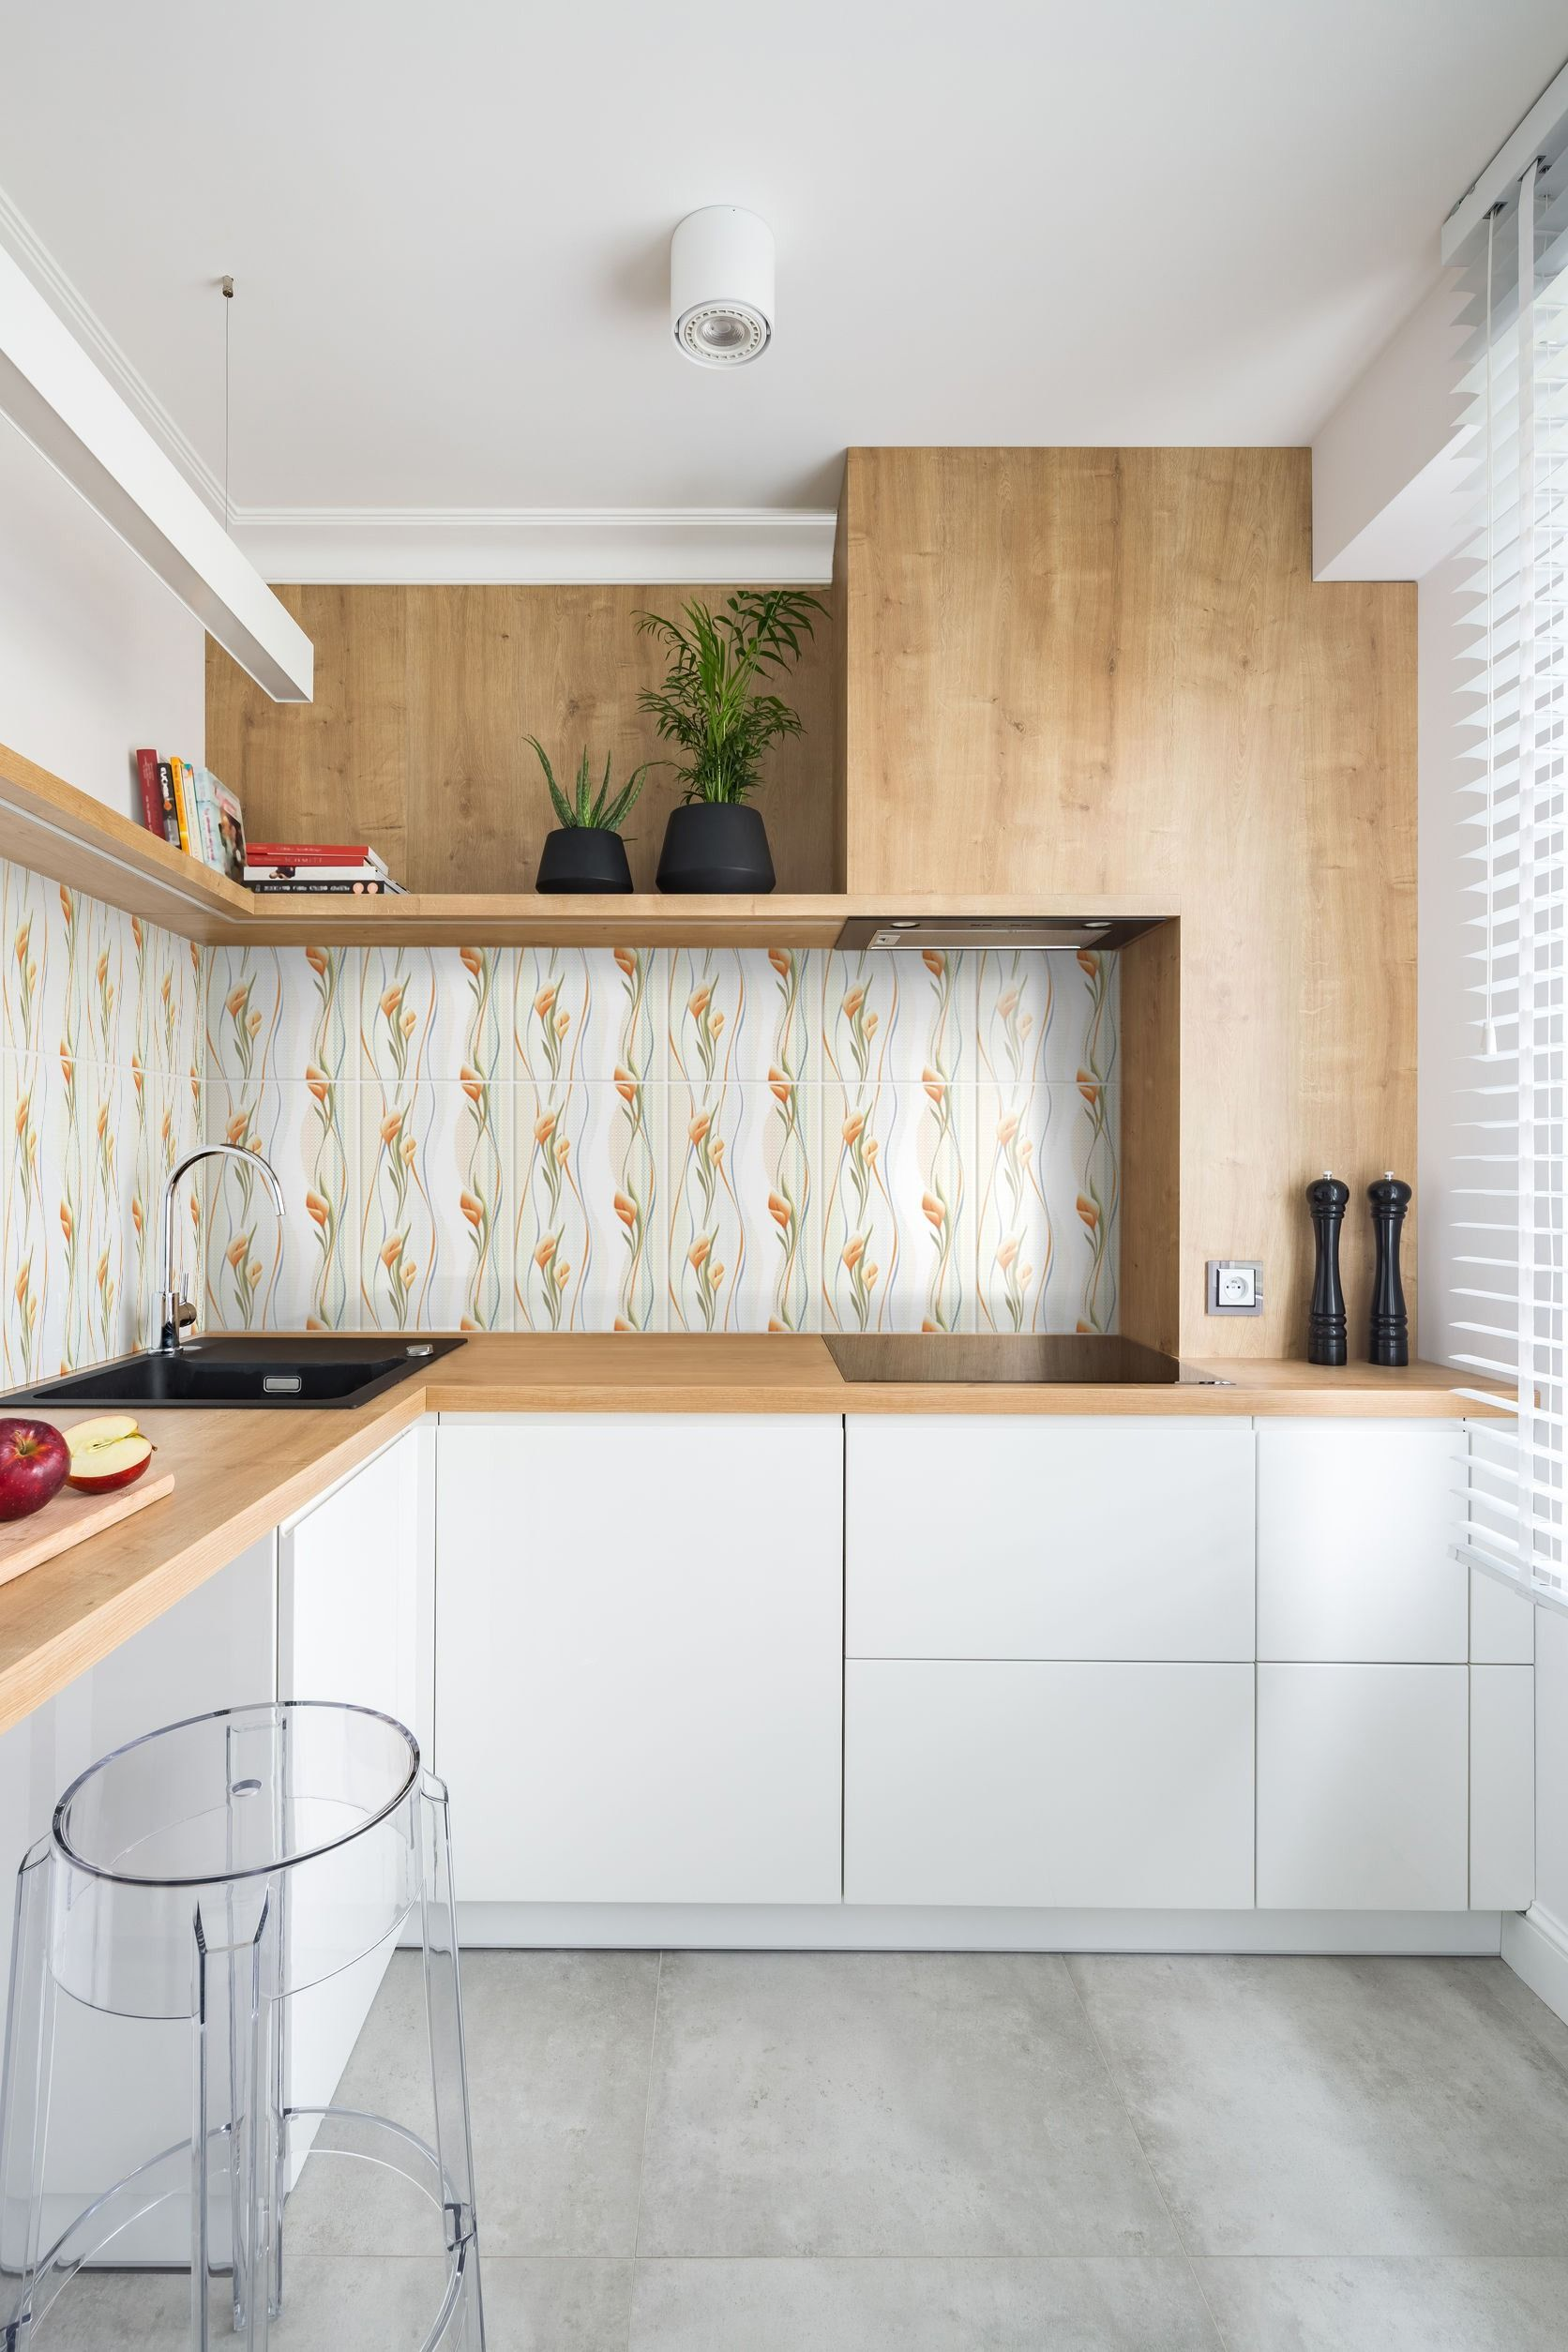 Keramik Dapur Motif Bunga